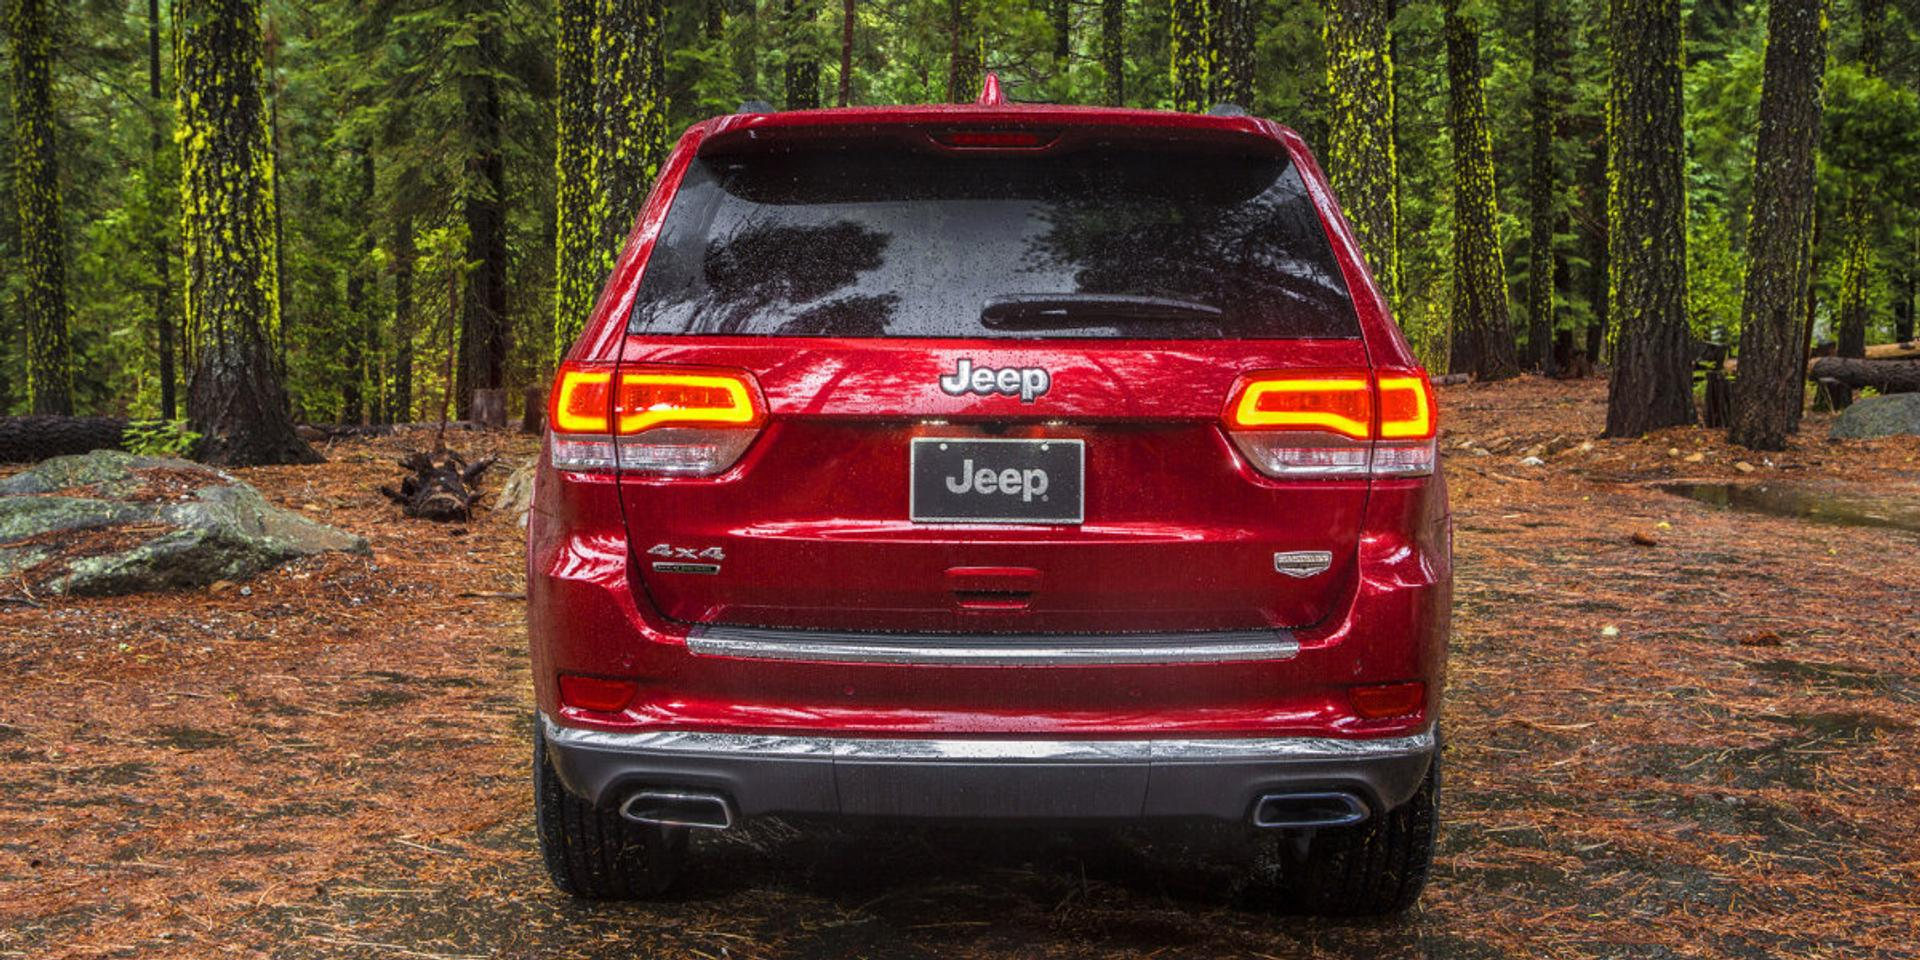 Jeep Grand Cherokee rear view